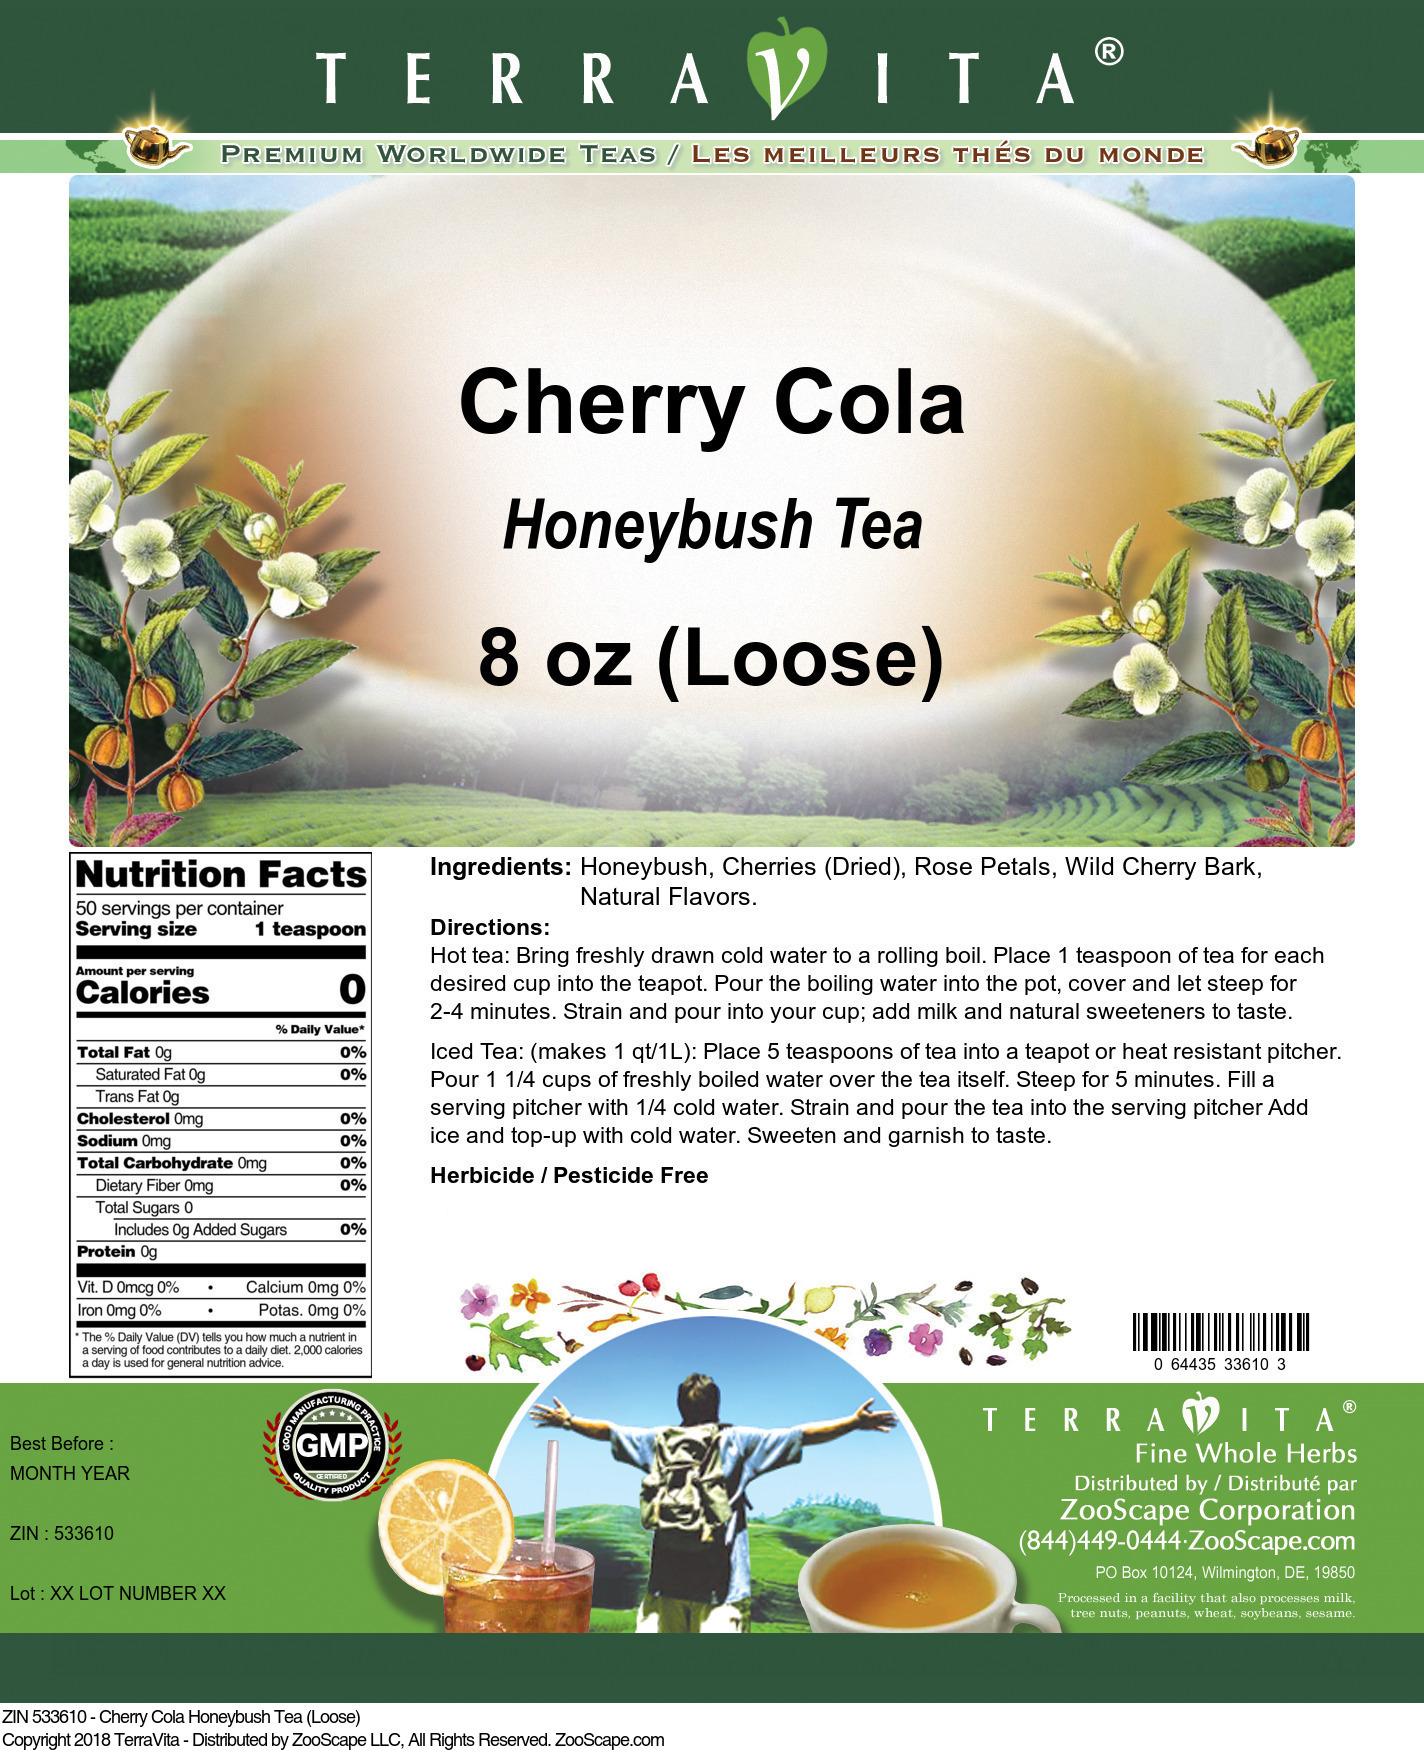 Cherry Cola Honeybush Tea (Loose)